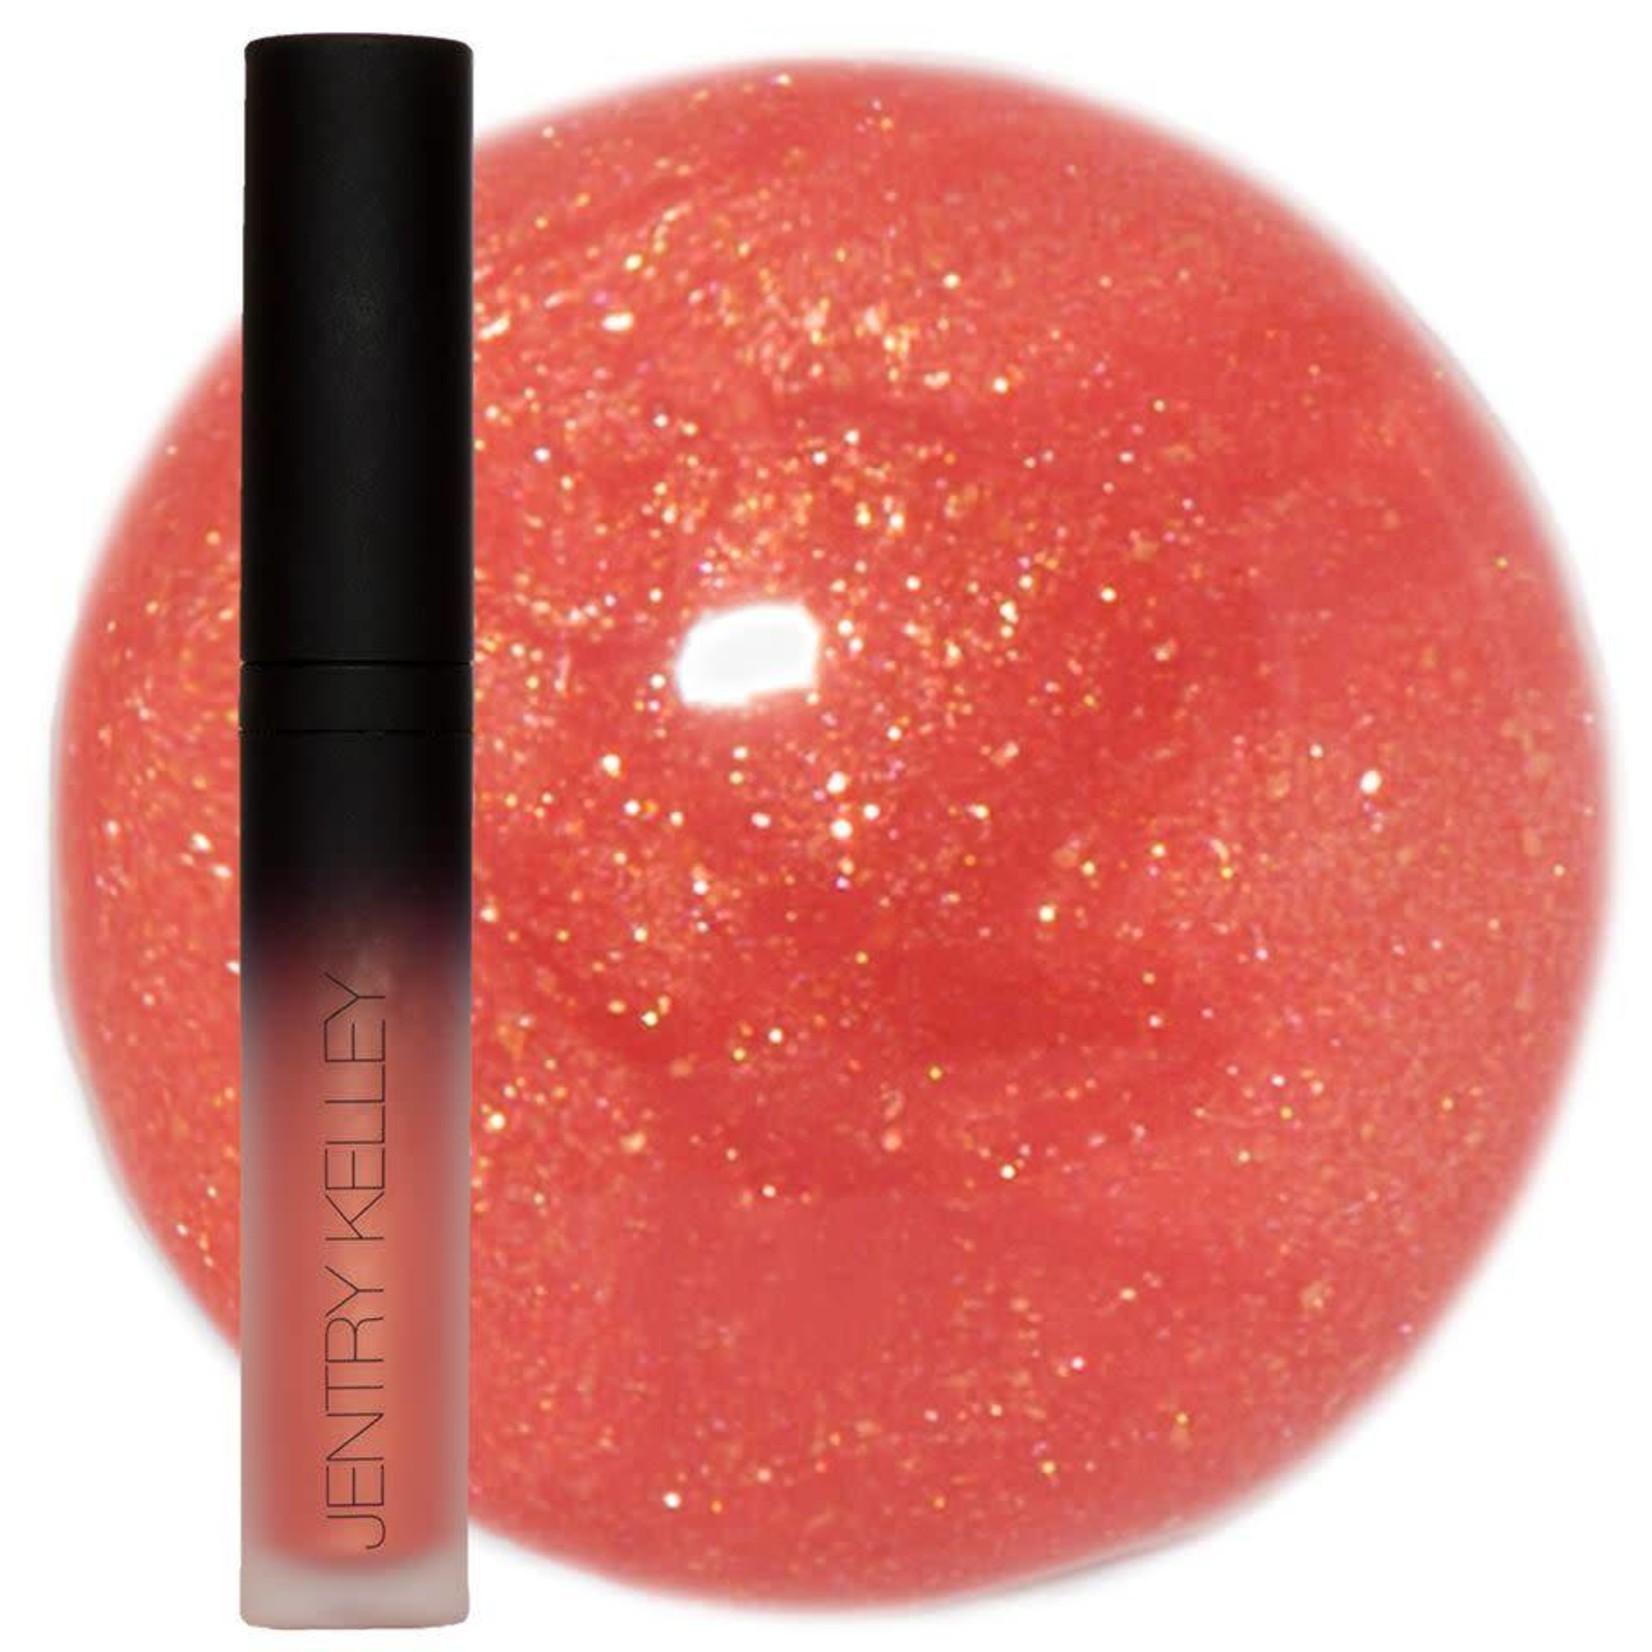 JKC LIP GLOSS - Oh My Clementine Lip